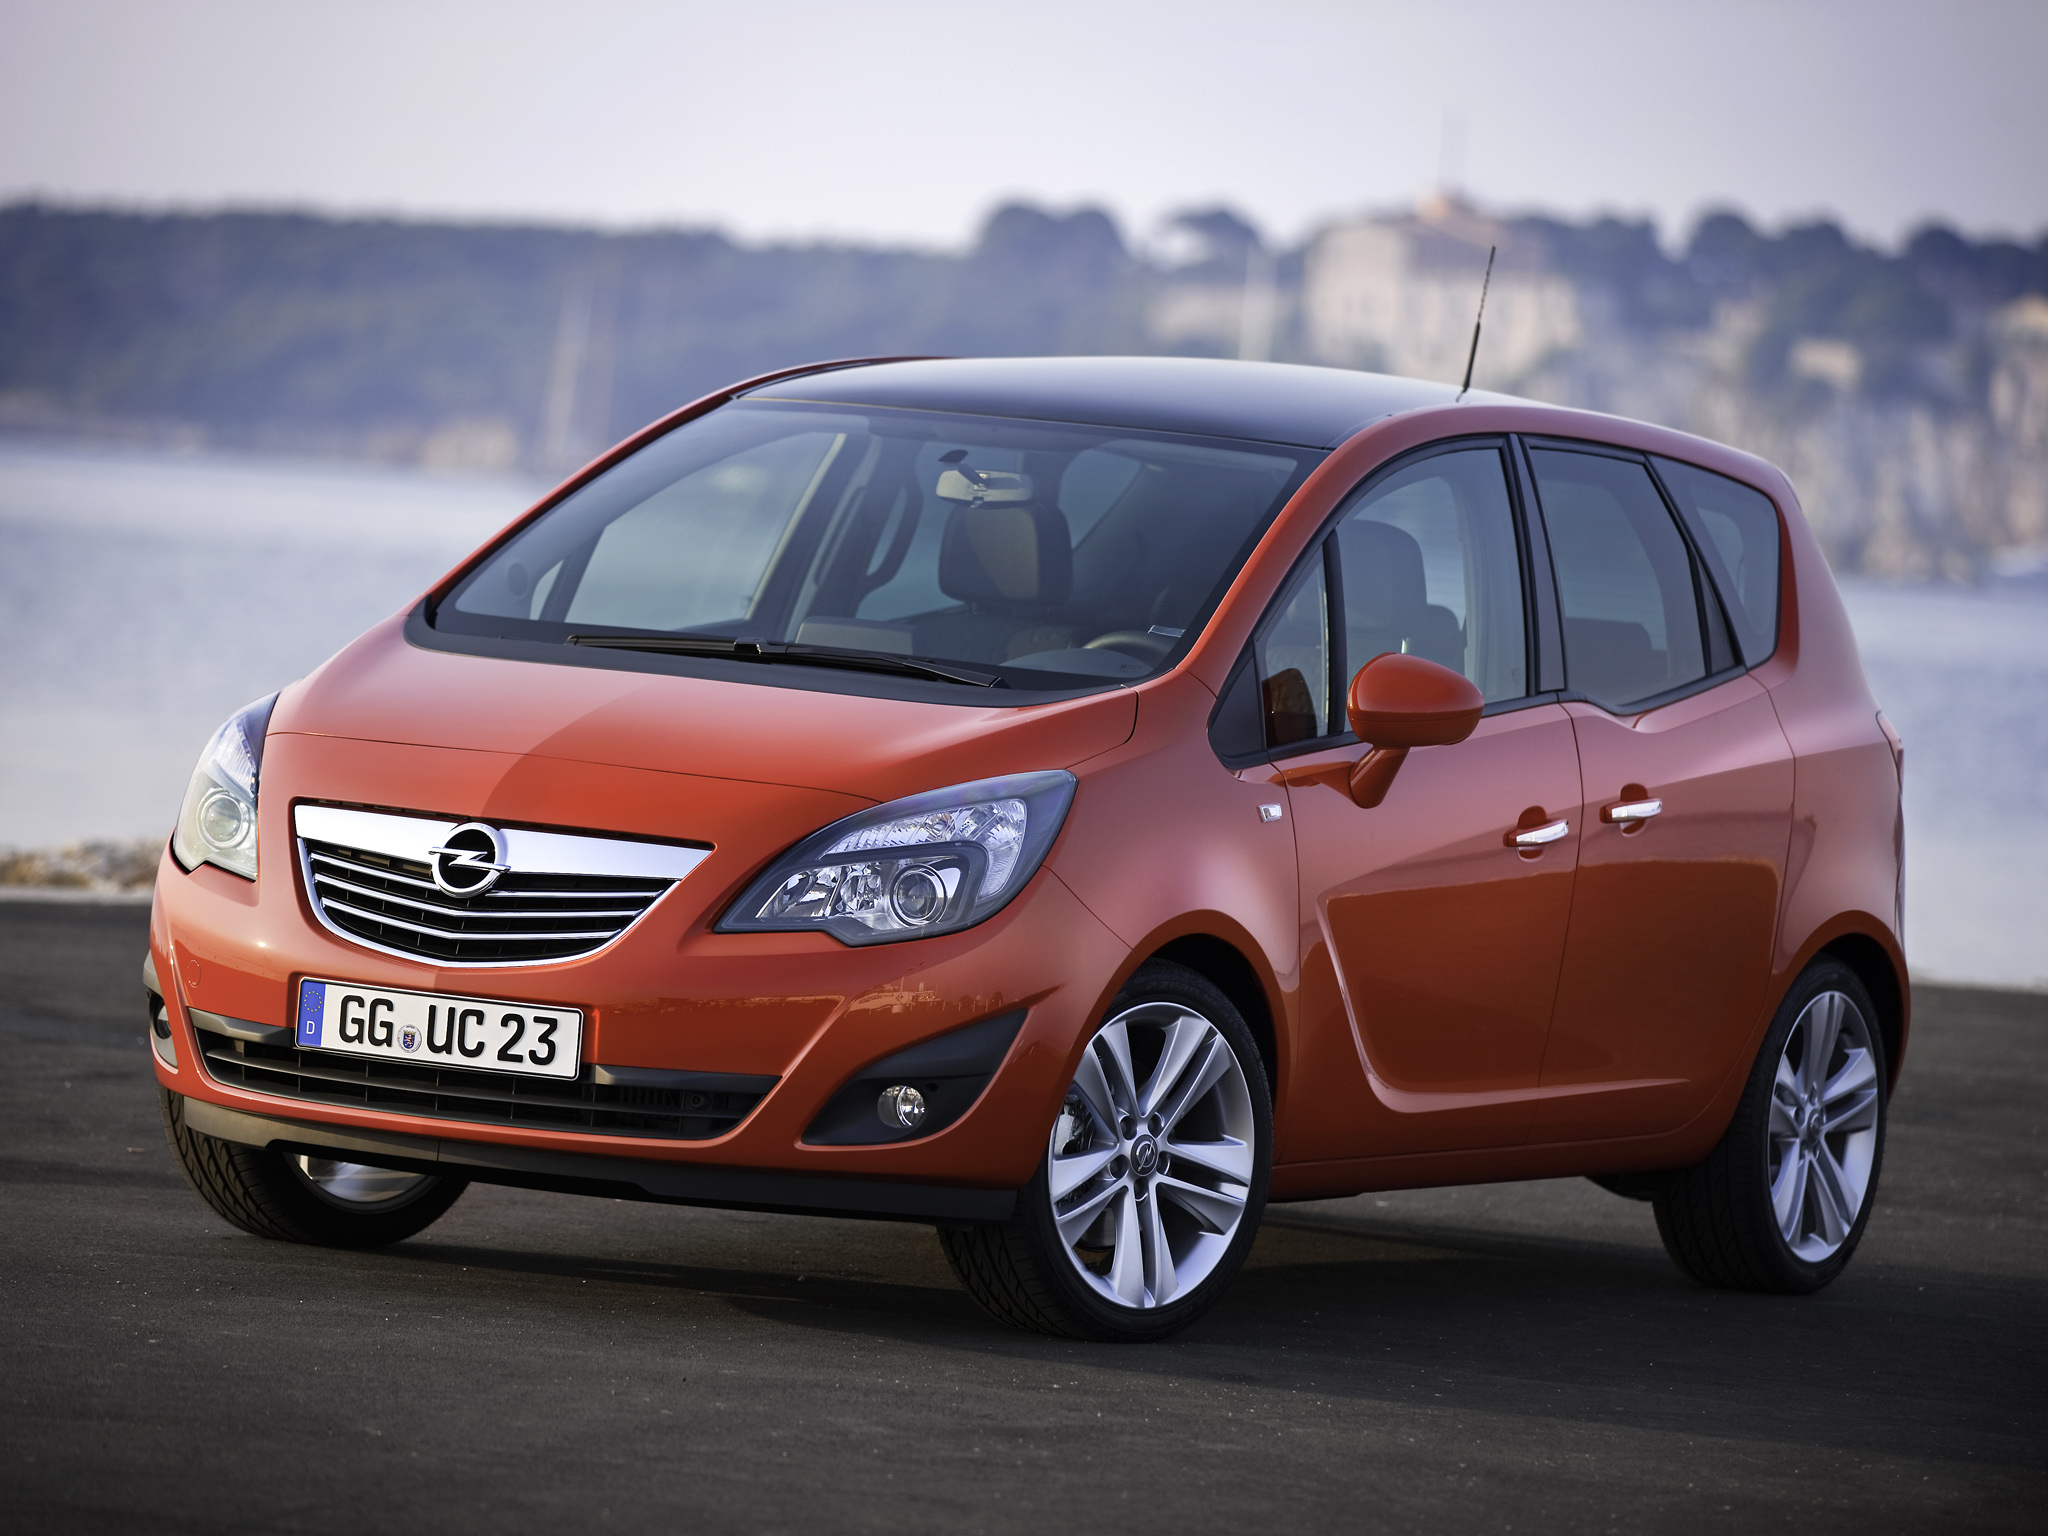 Dossier - Opel Meriva - Autovisie.nl